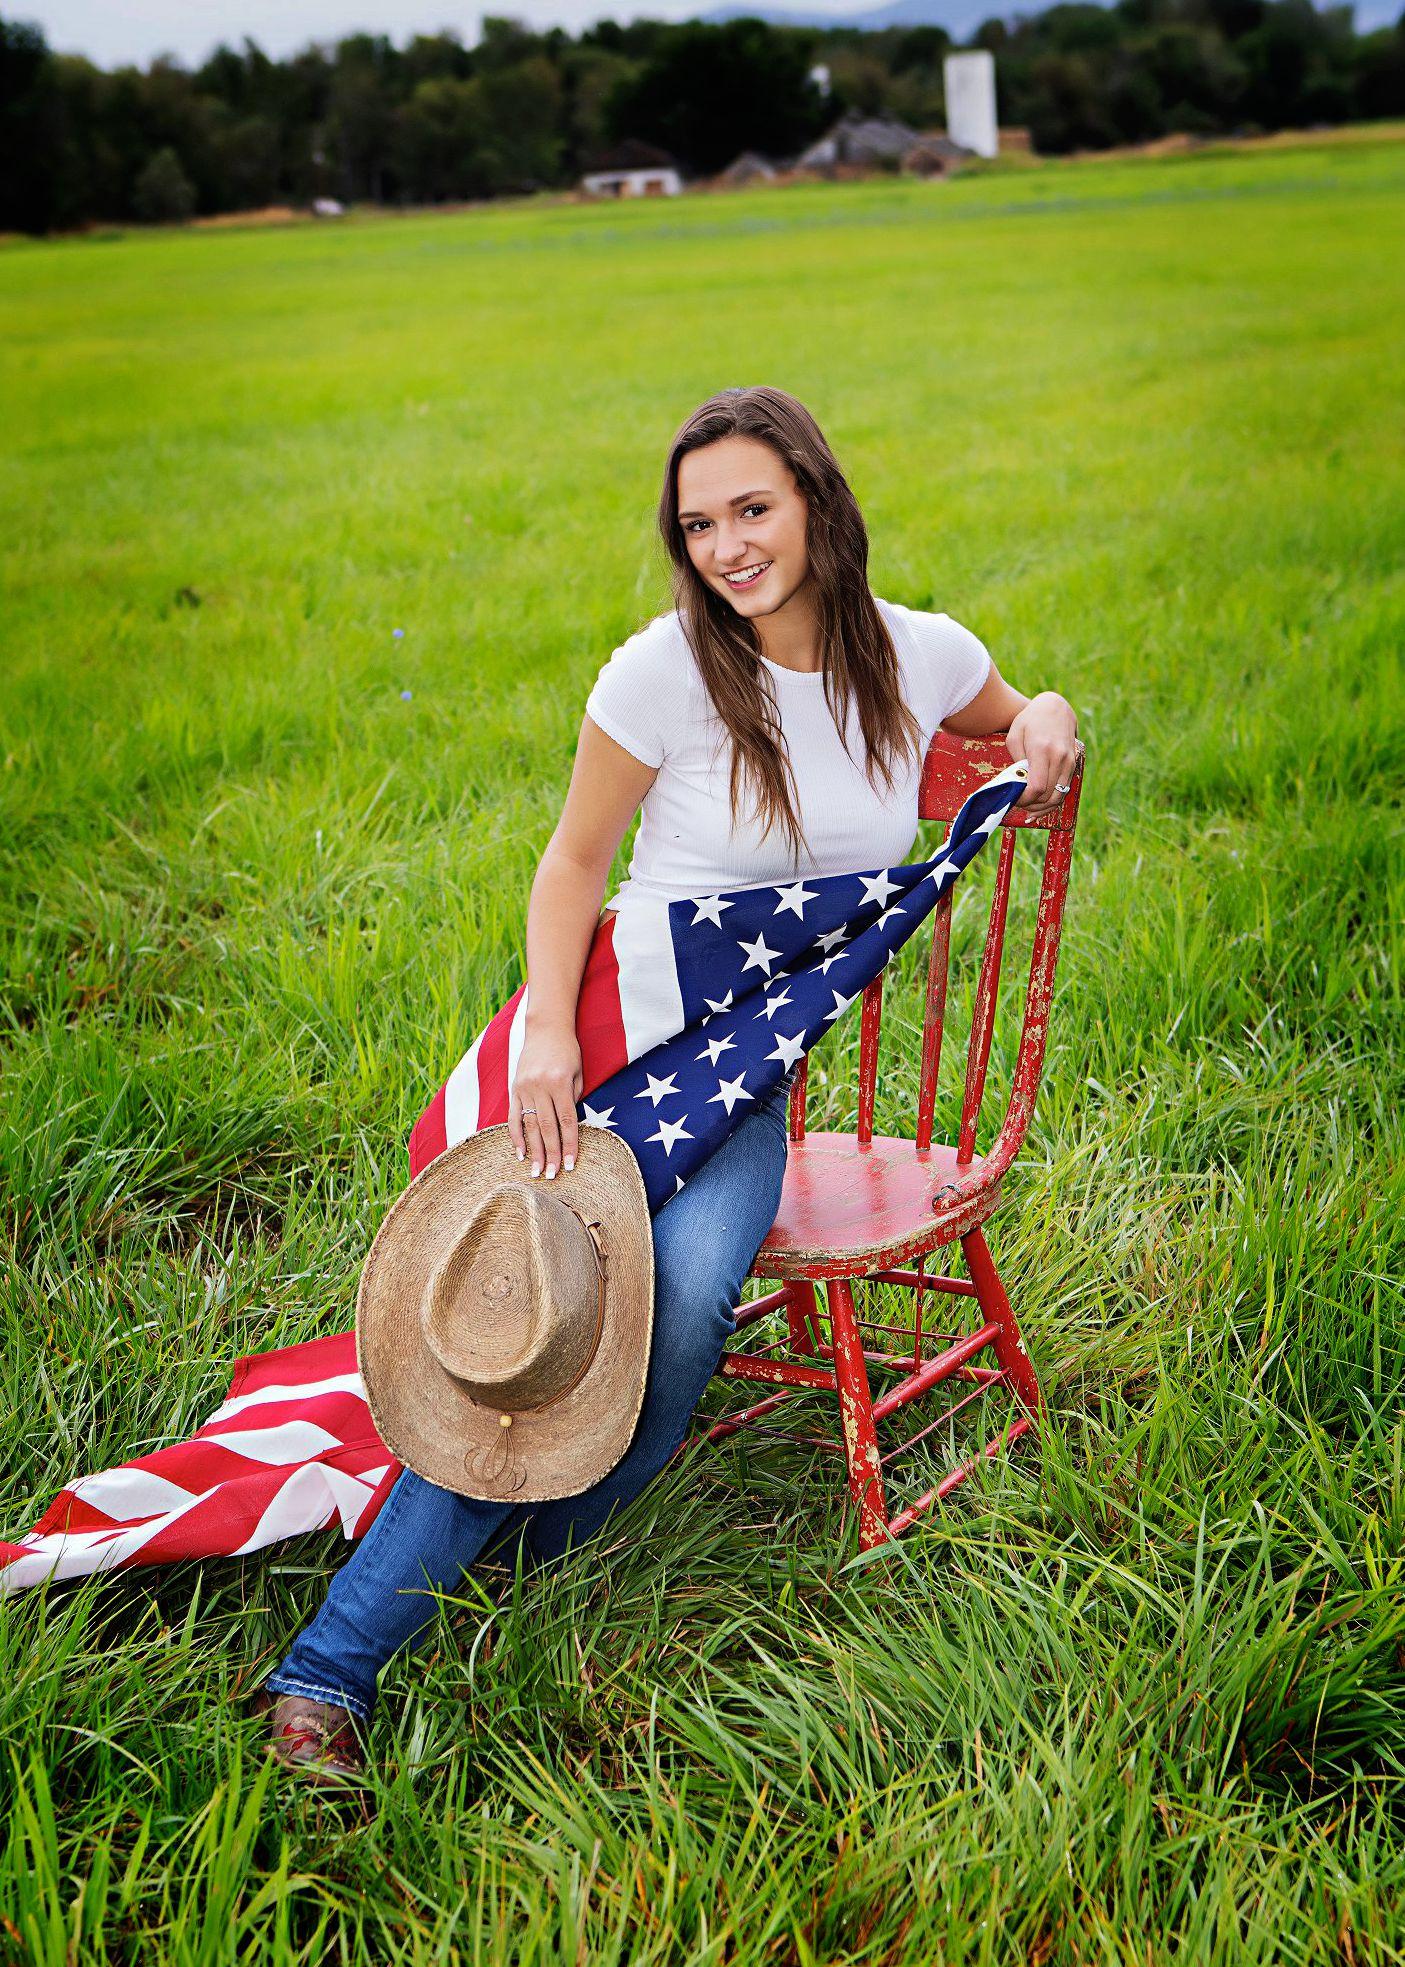 high school senior girl with flag